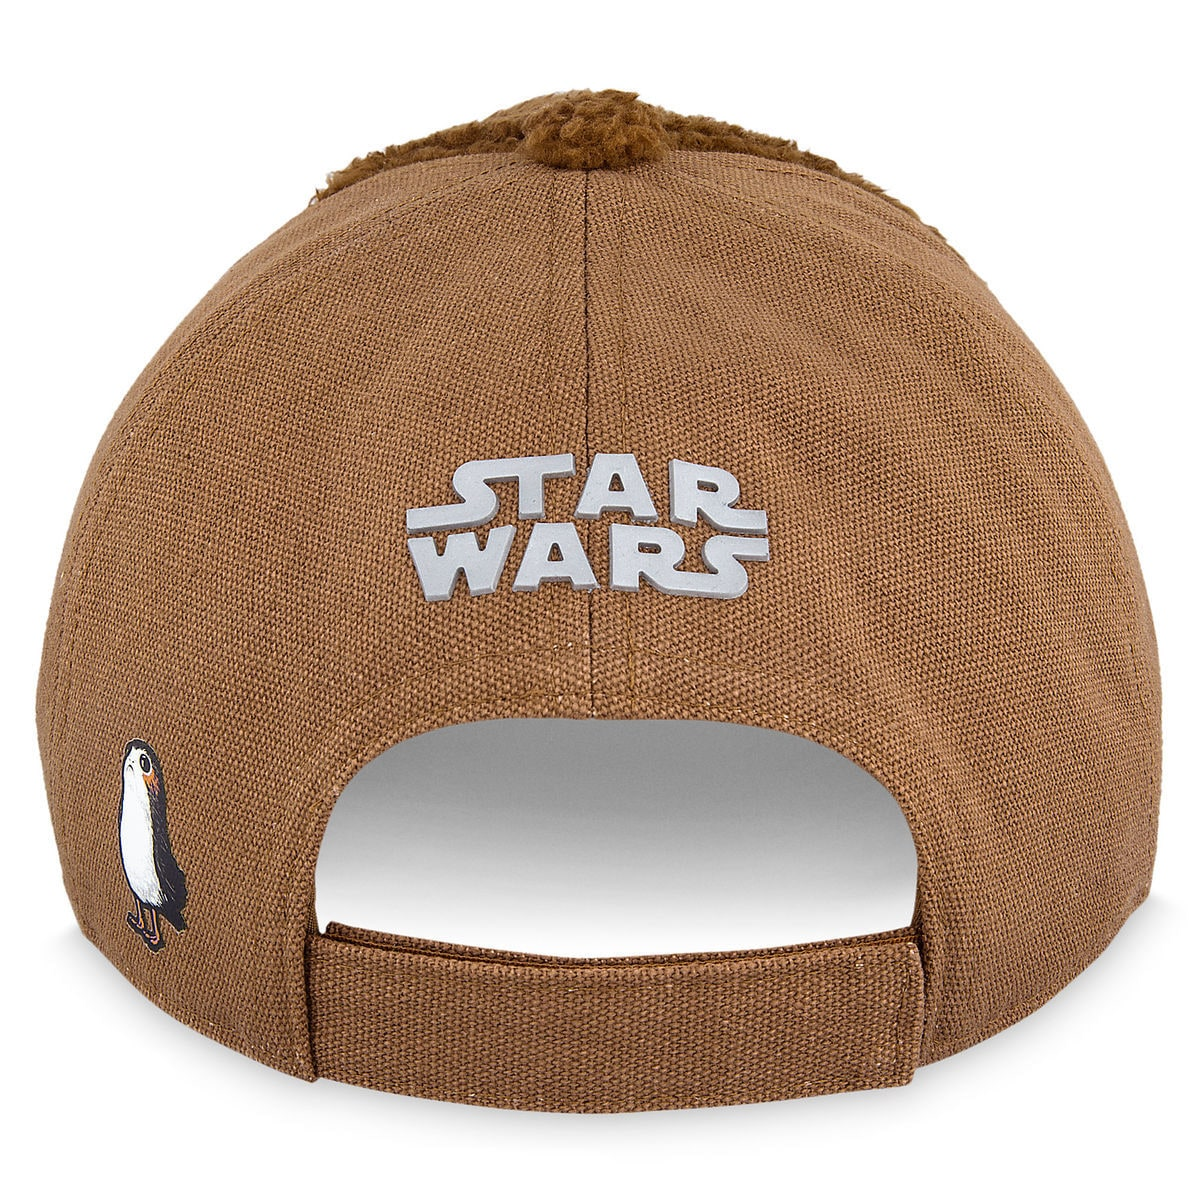 Chewbacca Fuzzy Baseball Cap for Adults - Star Wars  The Last Jedi ... 67237adbf76